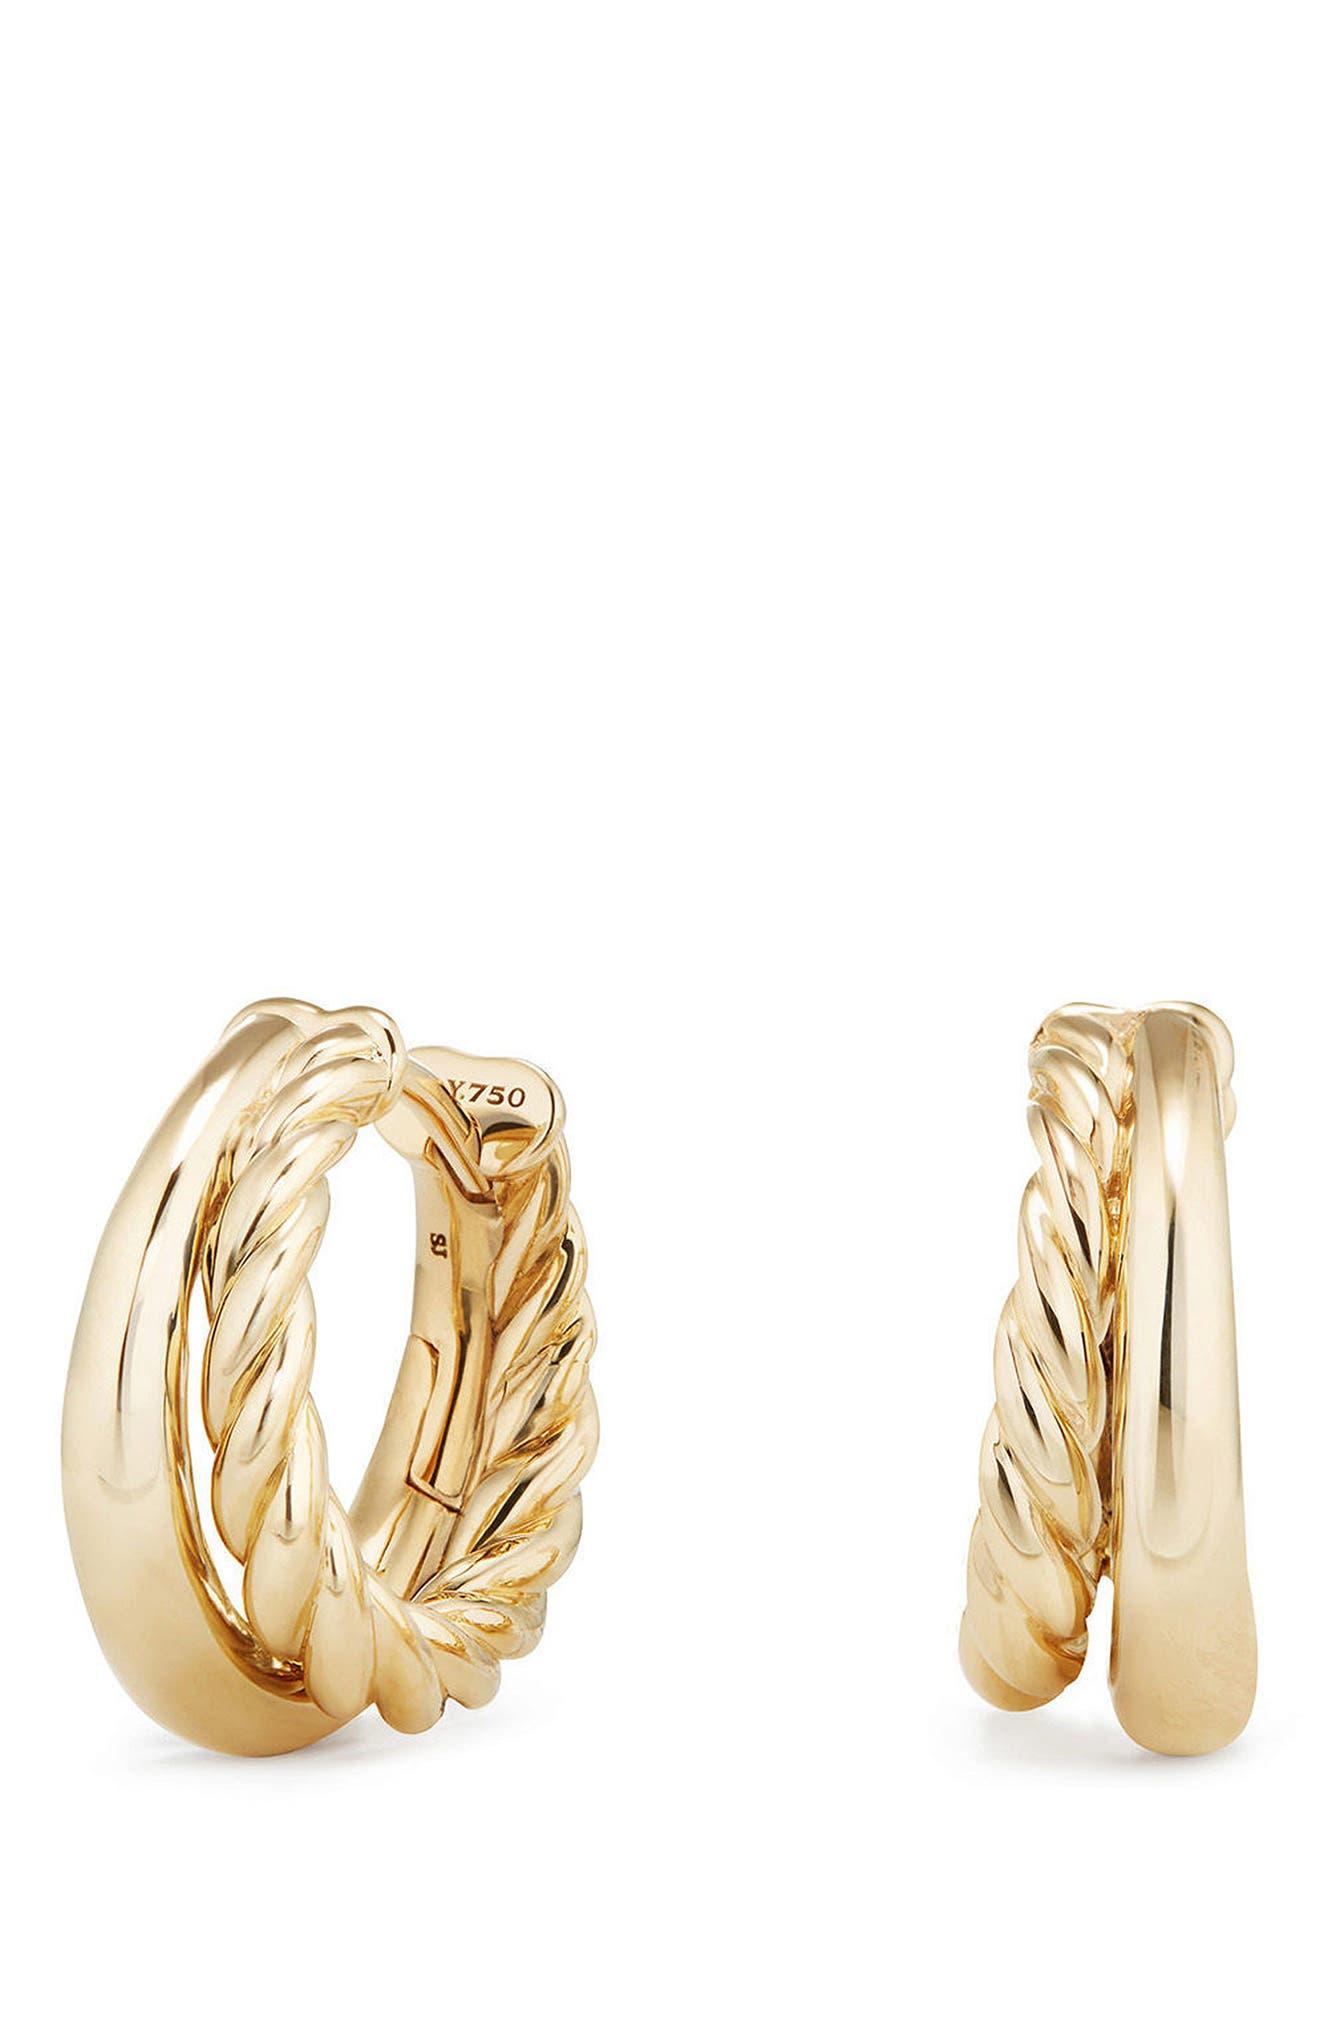 Main Image - David Yurman Pure Form Hoop Earrings in 18K Gold, 12mm